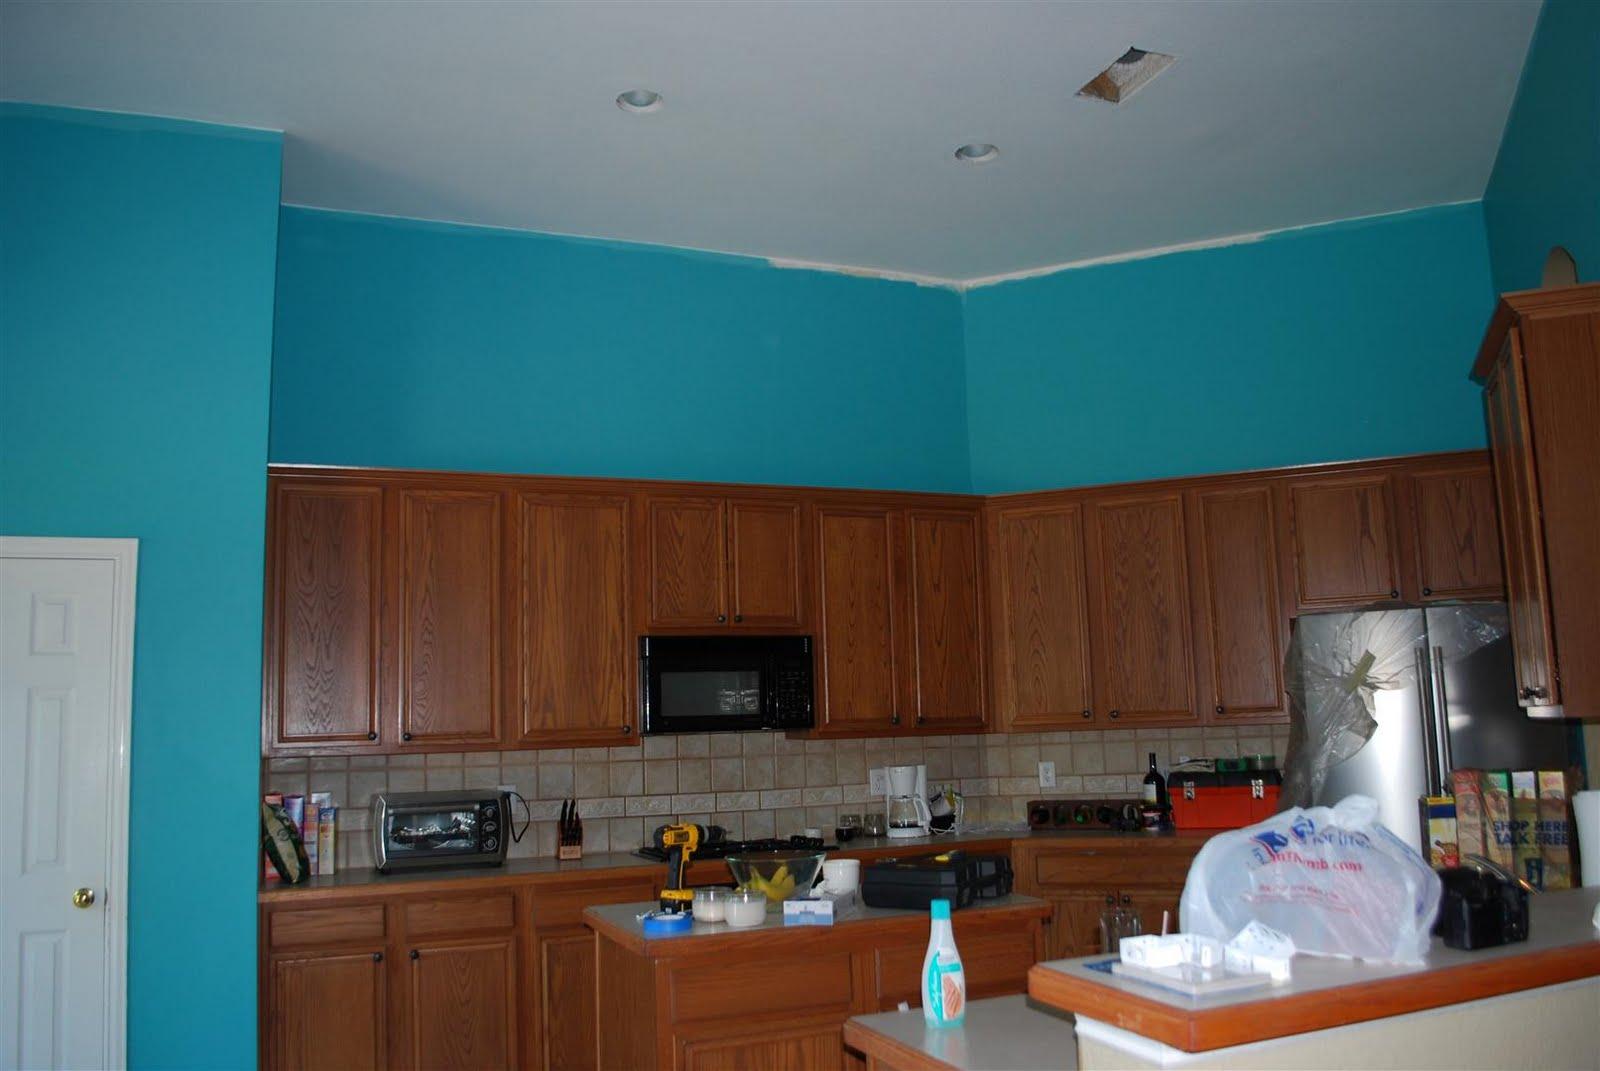 craftyc0rn3r: Kitchen Renovations - Installing a New Range